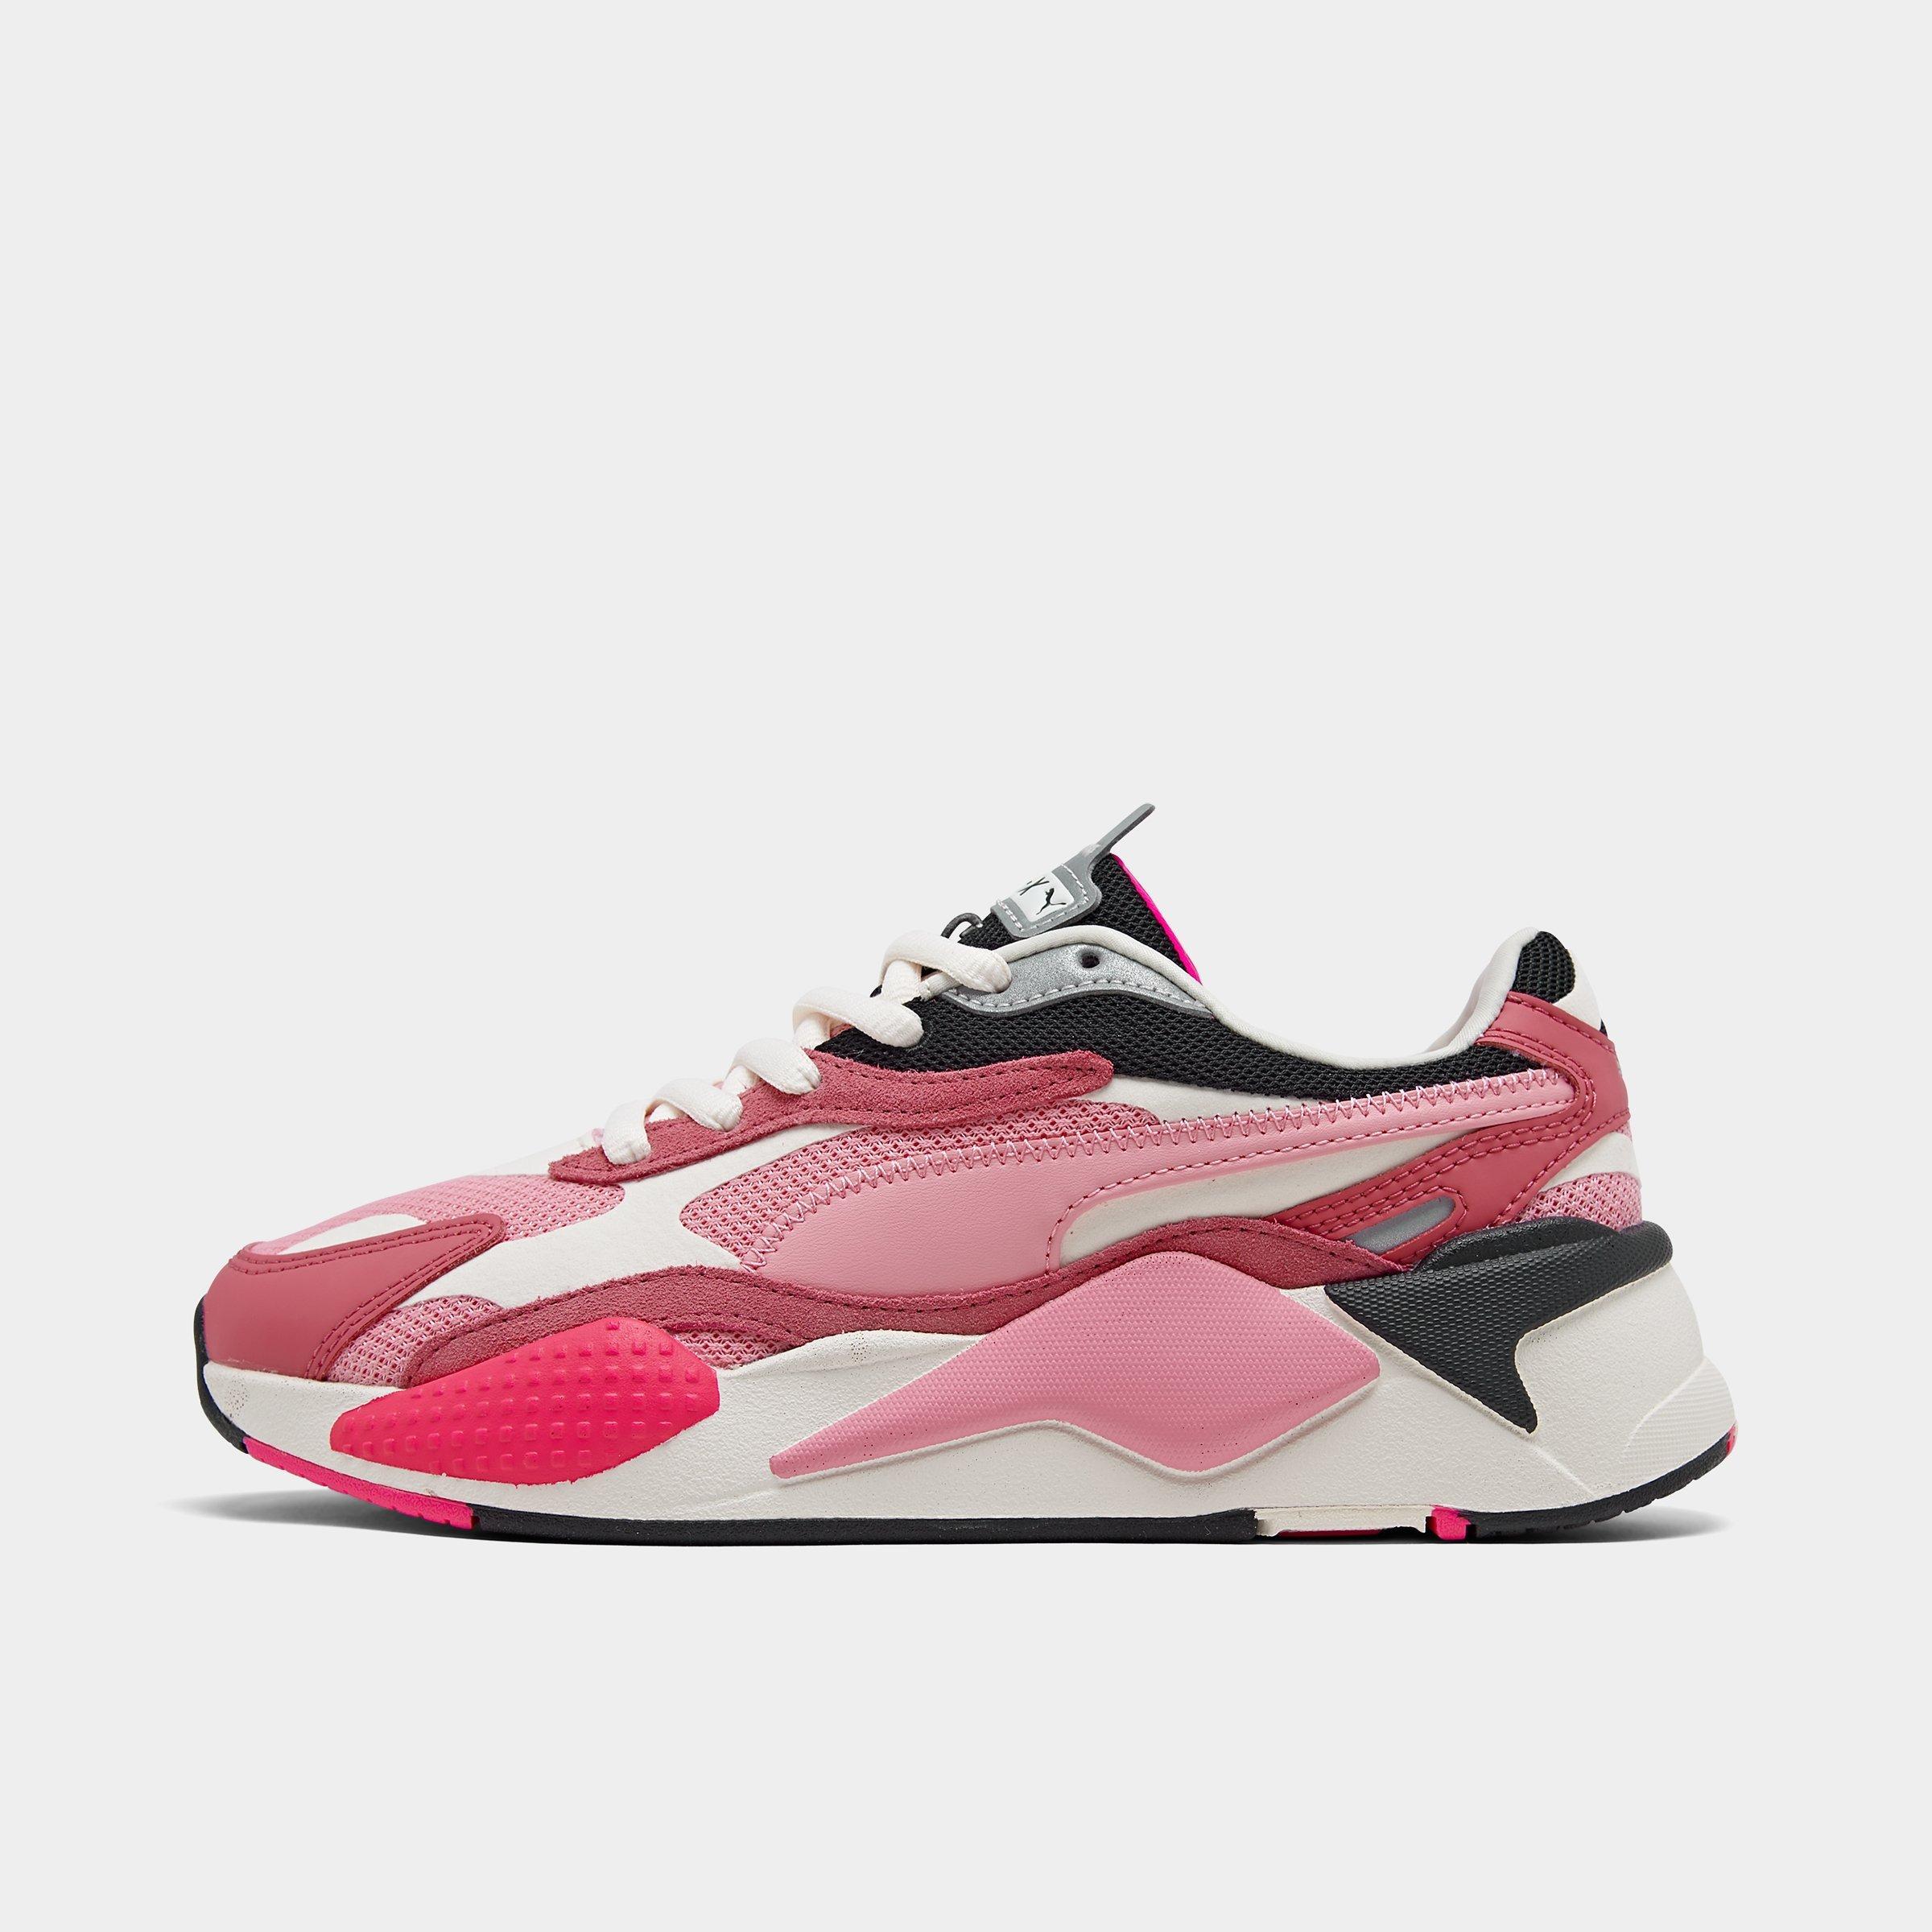 puma shoes finish line